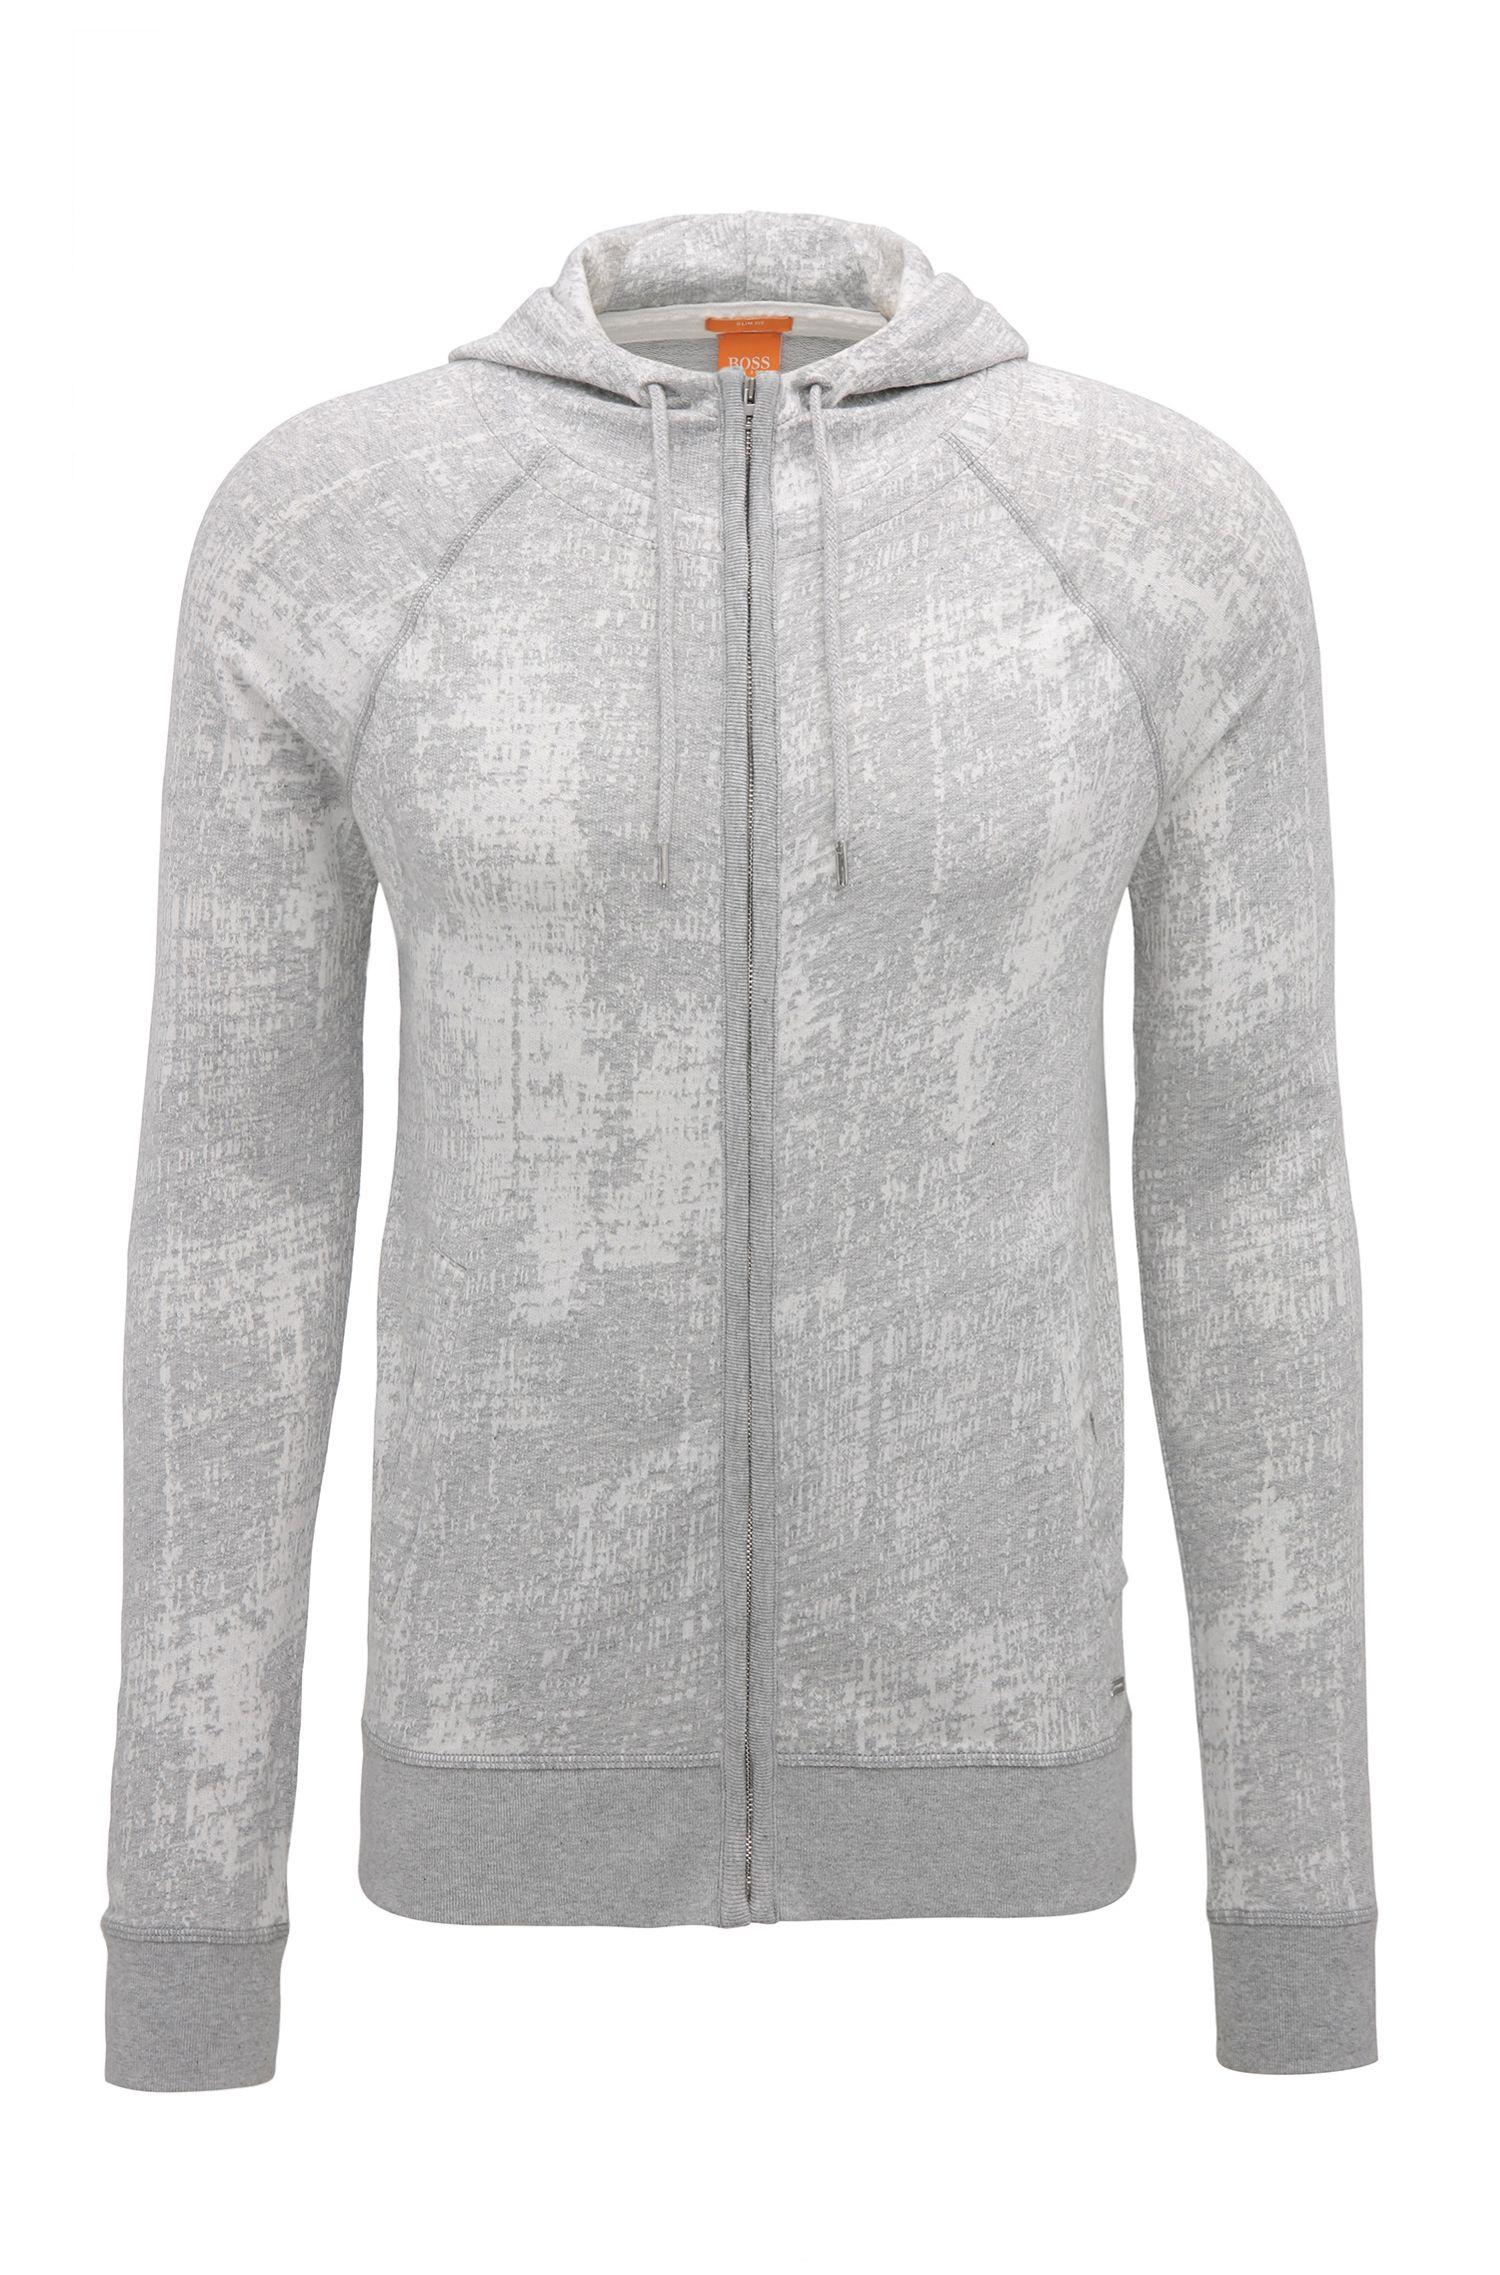 Slim-fit zip-through sweatshirt in cotton jacquard